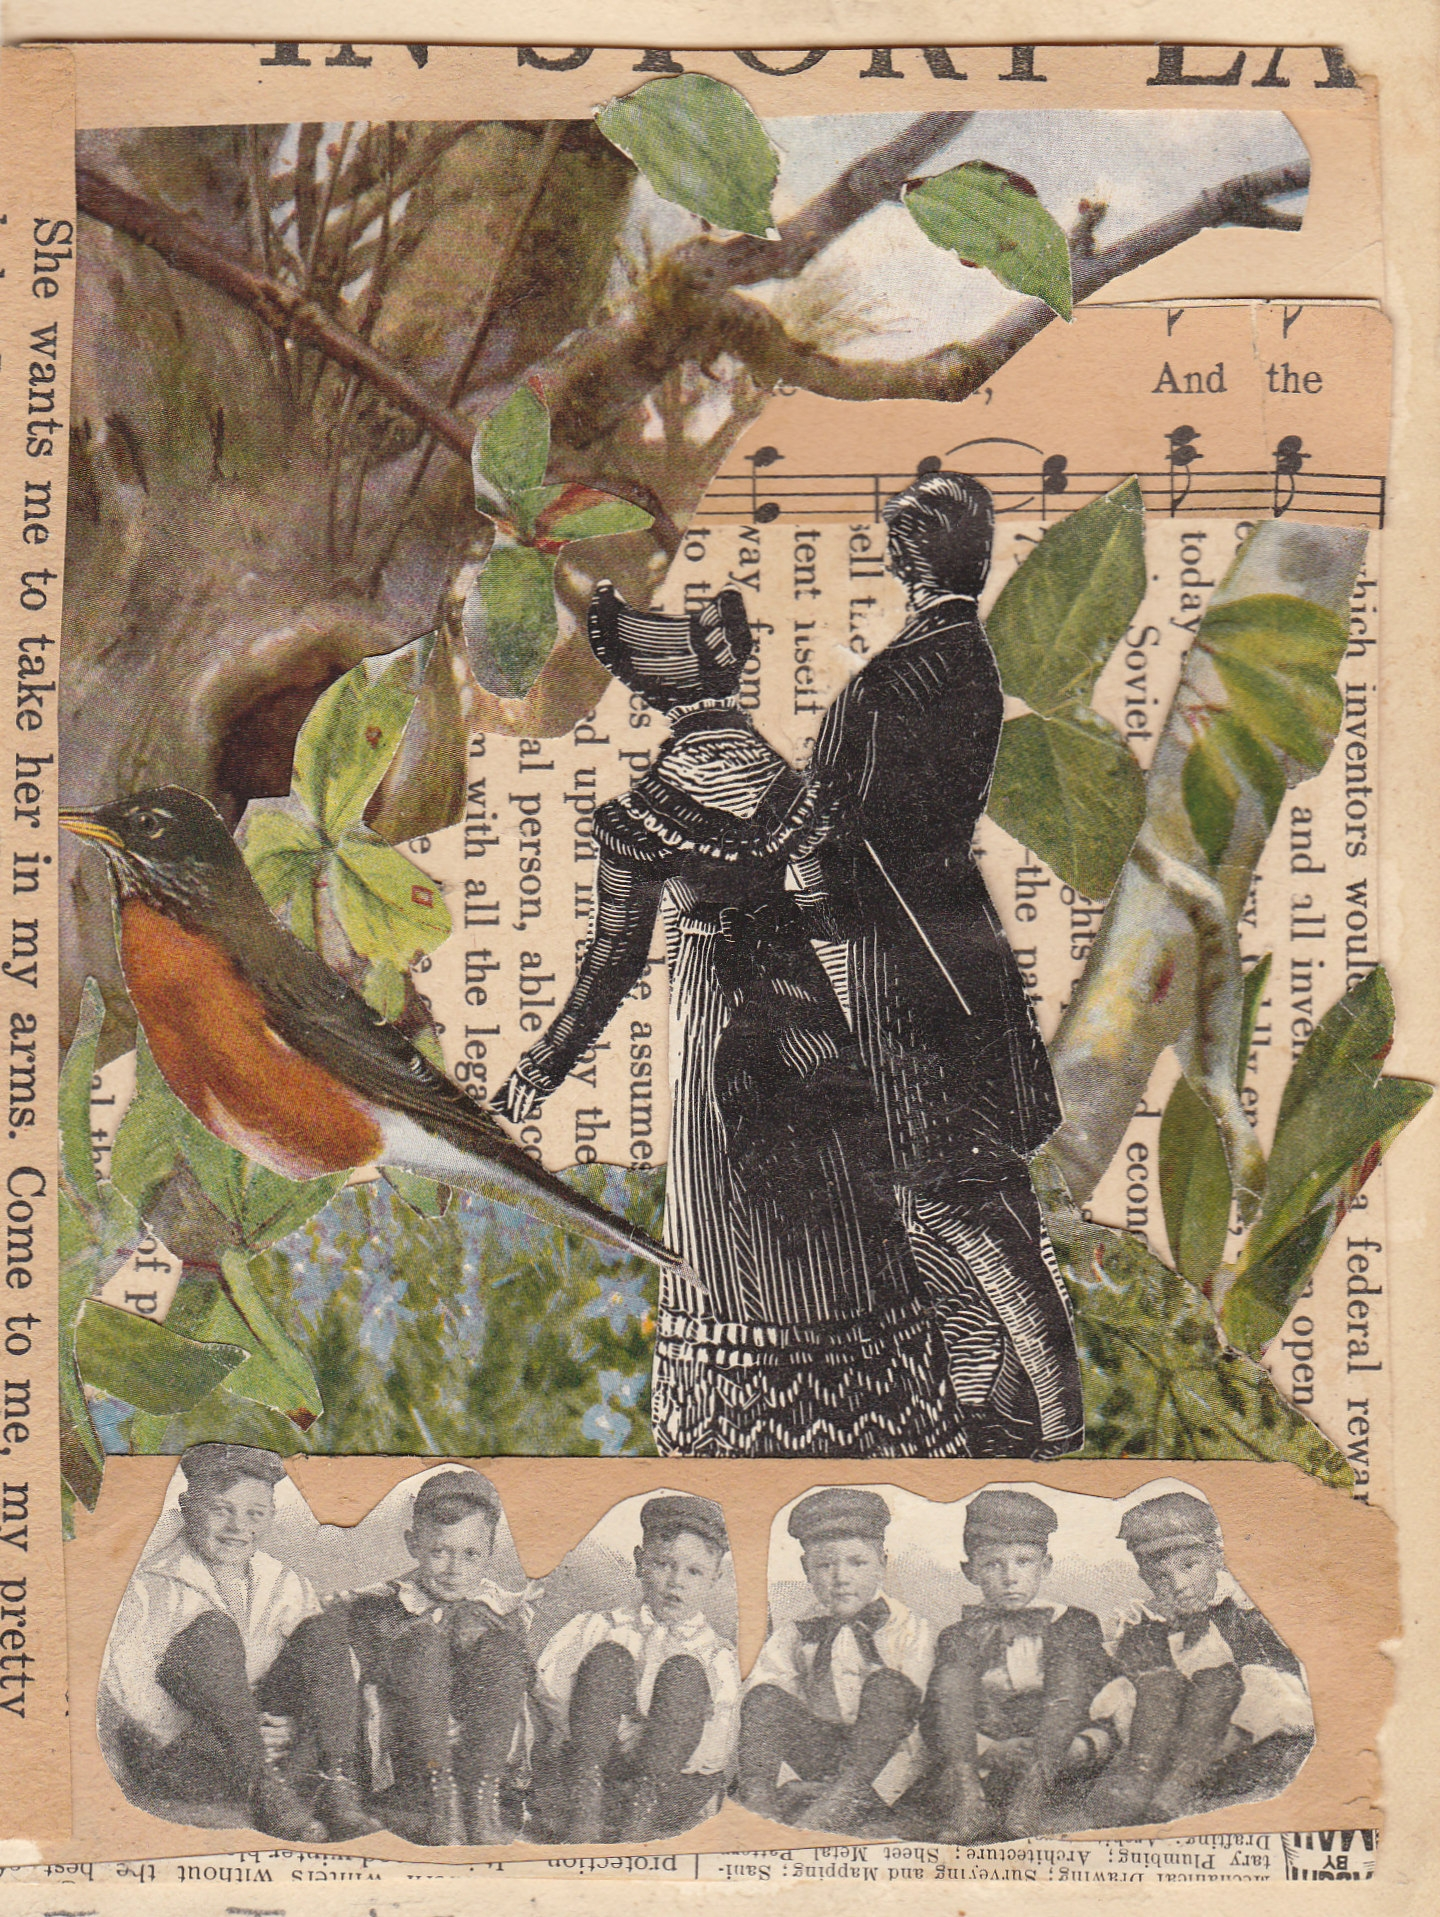 1897 series Collage created Jea - jeanneteolis | ello